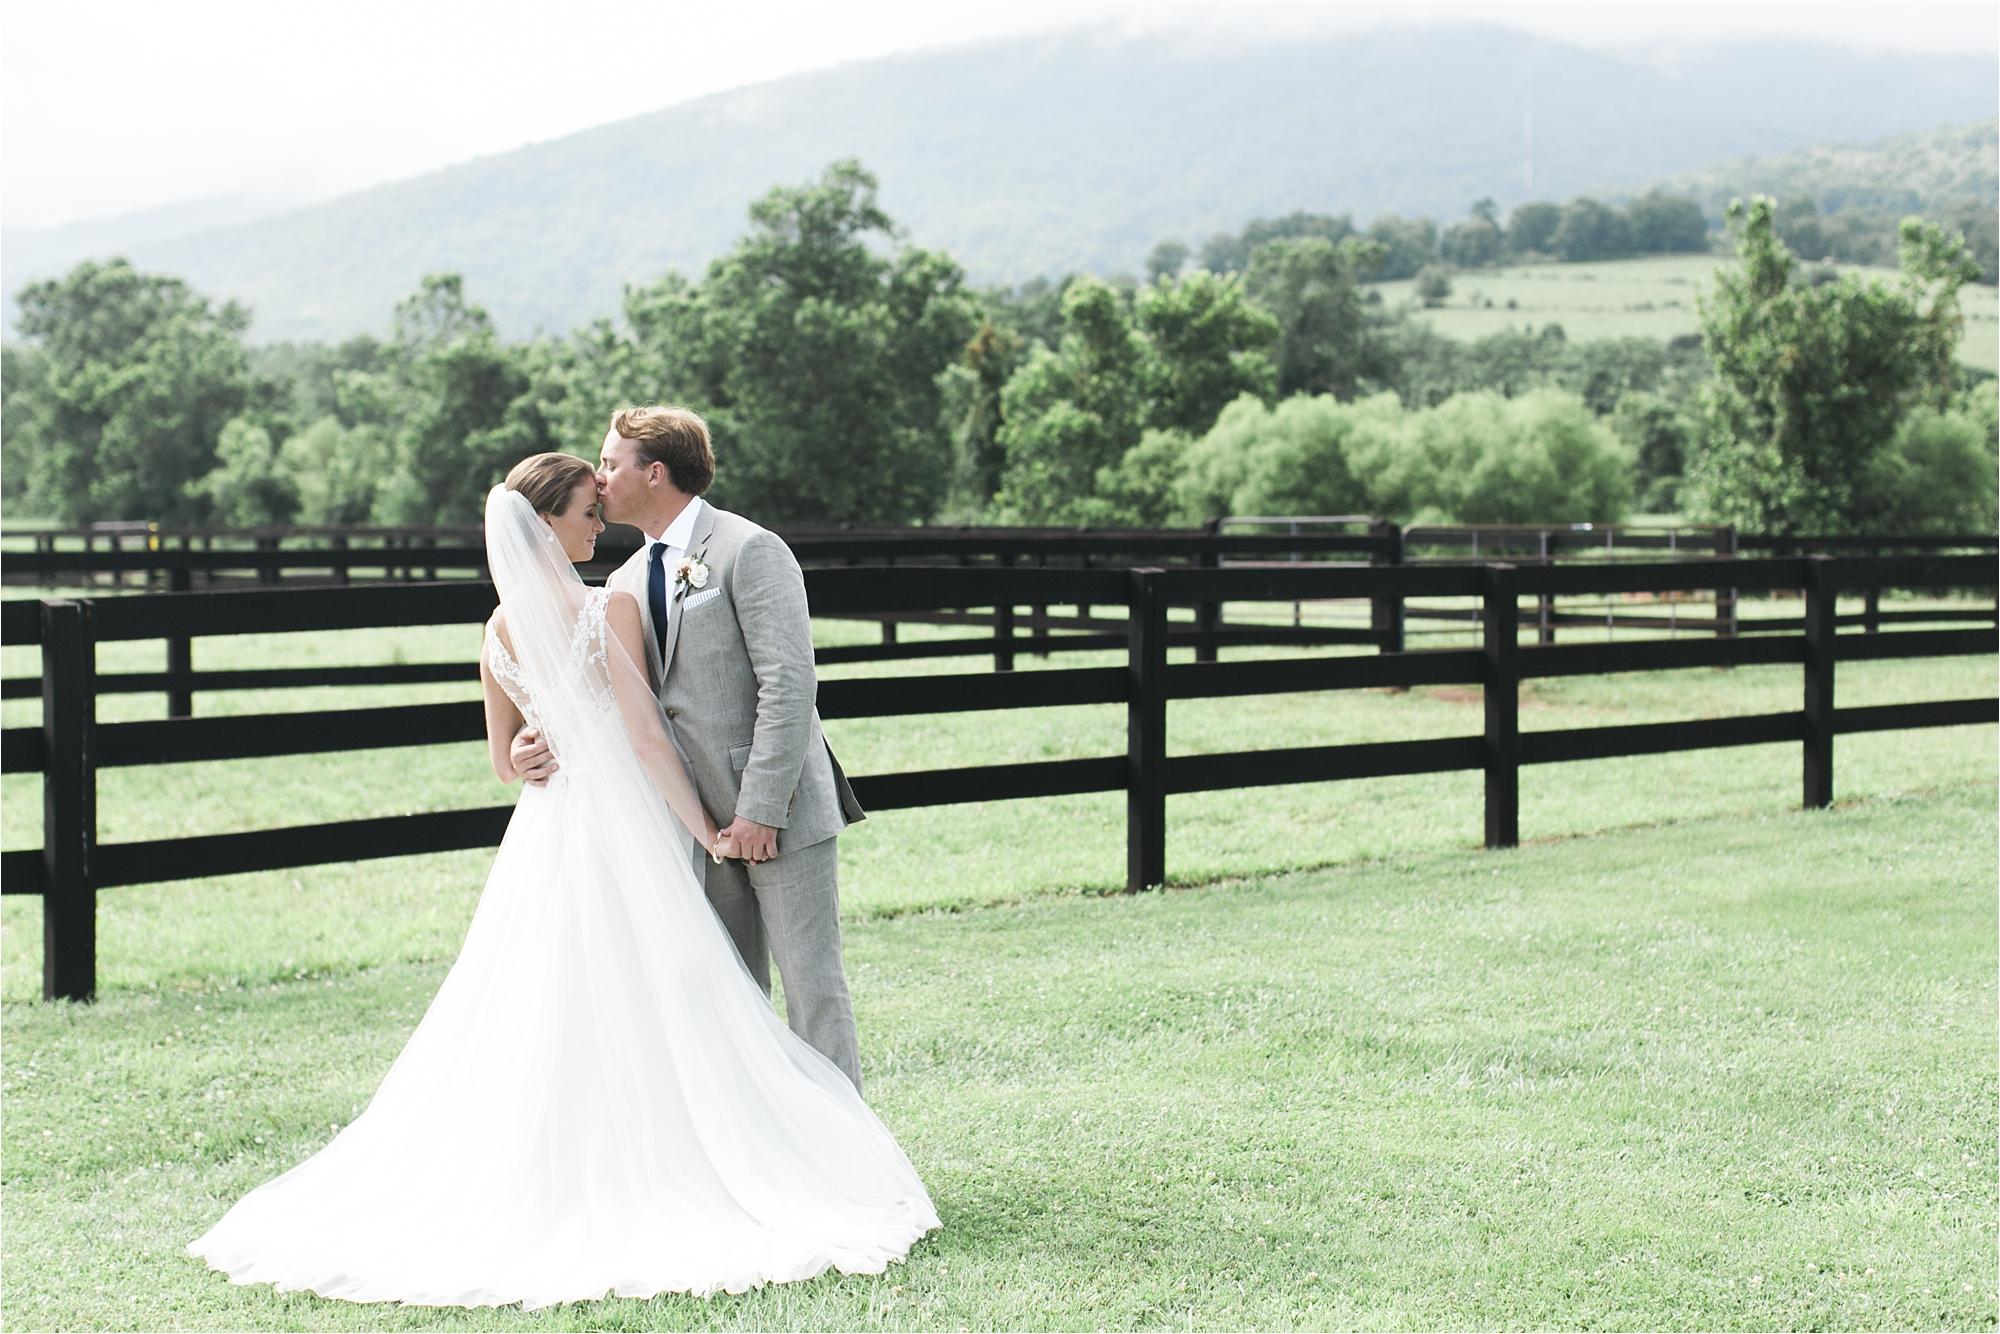 stephanie-yonce-charlottesville-virginia-king-family-vineyard-wedding-photos_0017.jpg